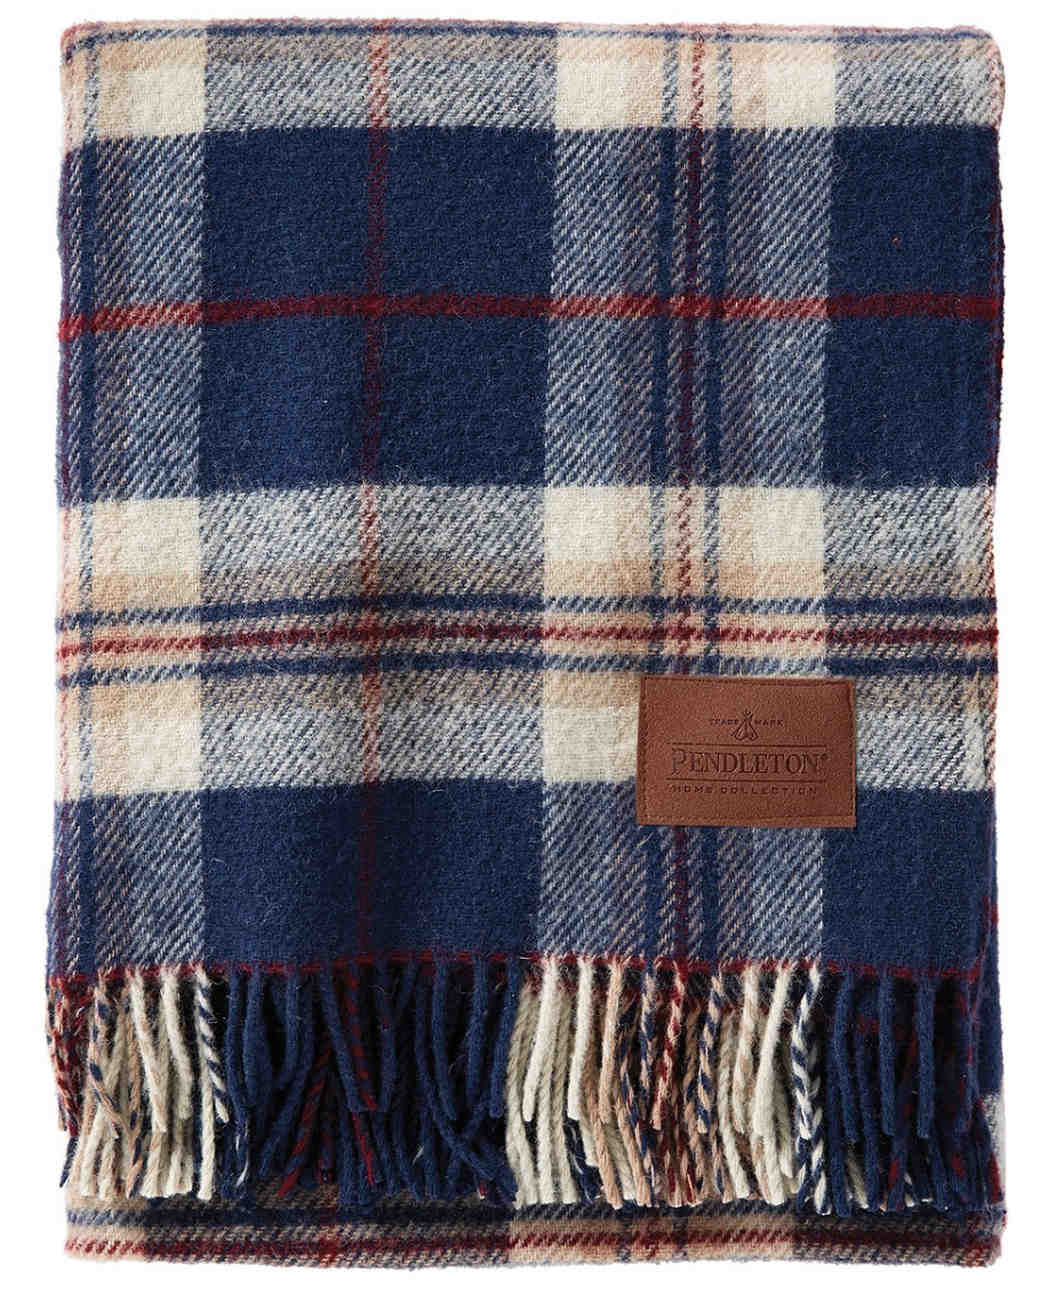 fathers-gift-guide-decor-pendleton-blanket-0515.jpg